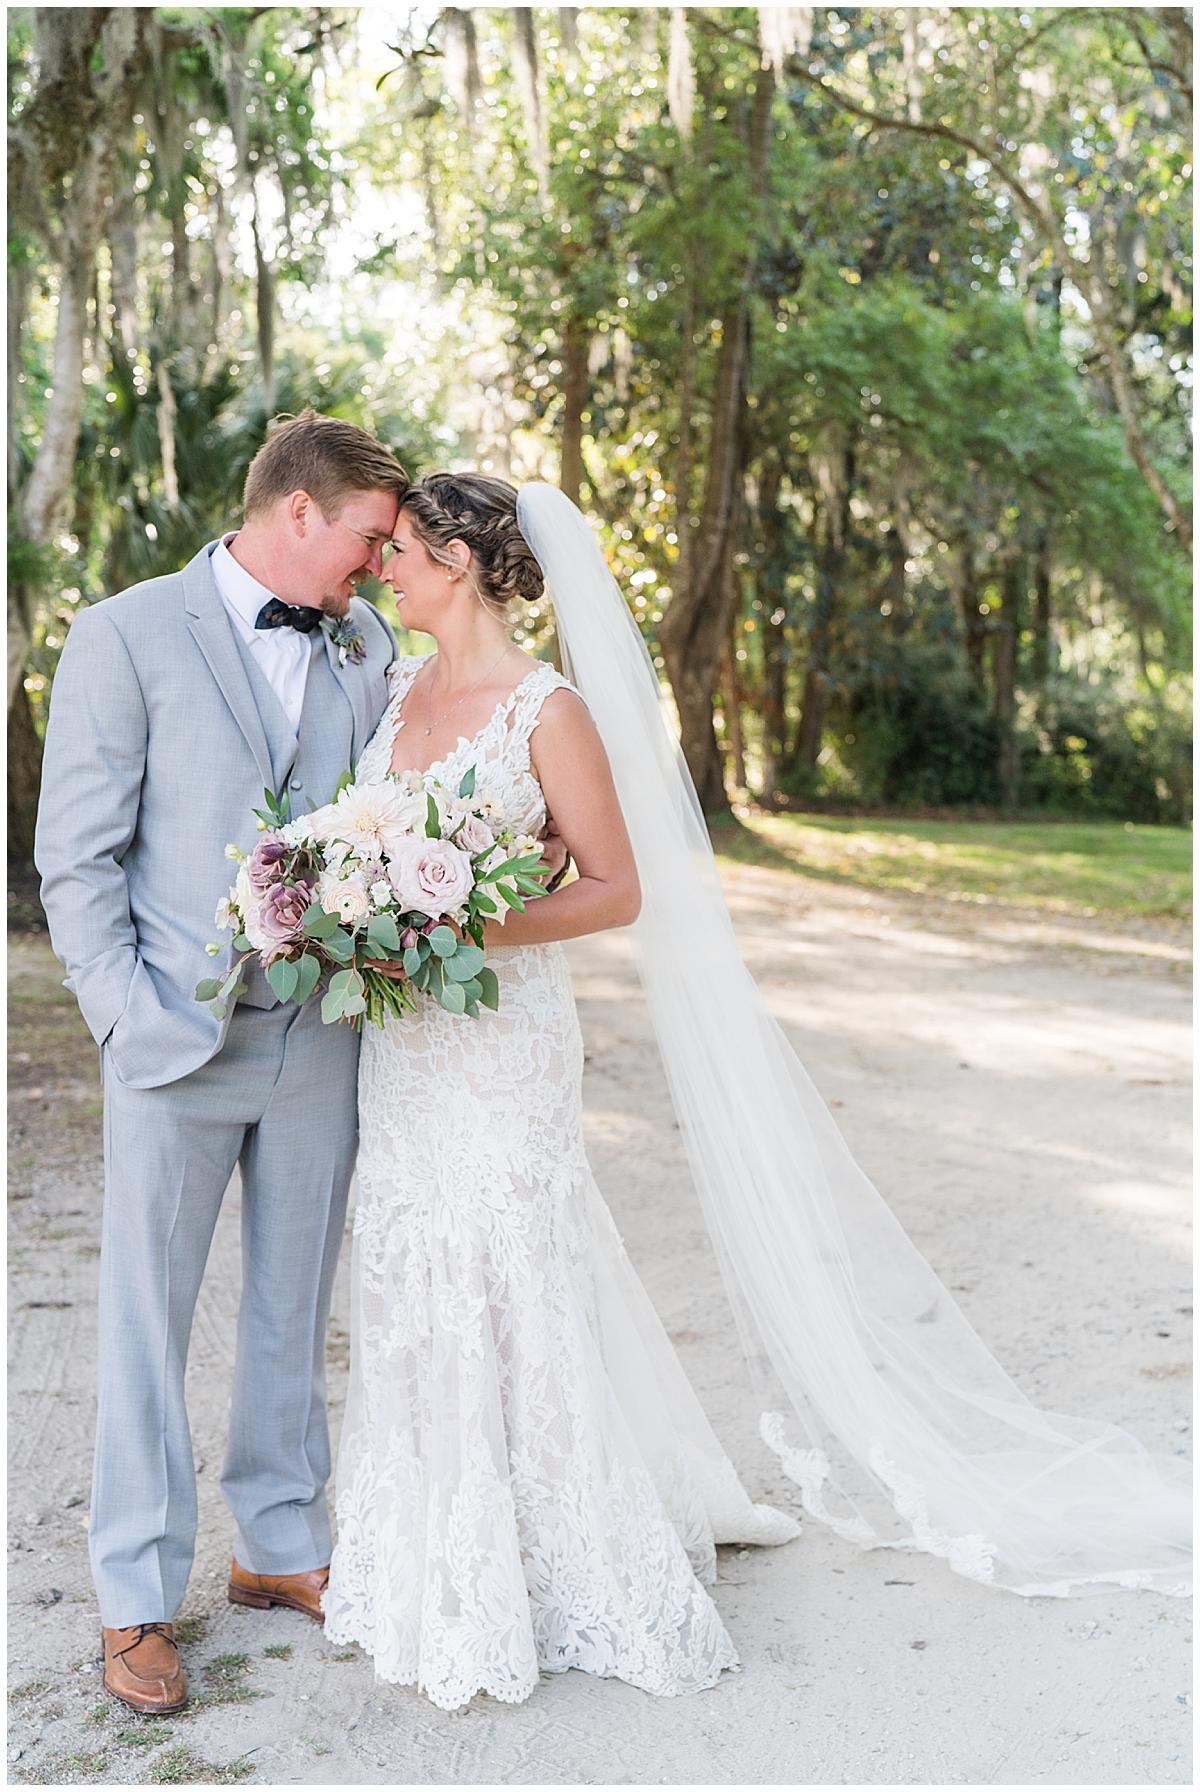 newlyweds pose on path during Charleston wedding photos